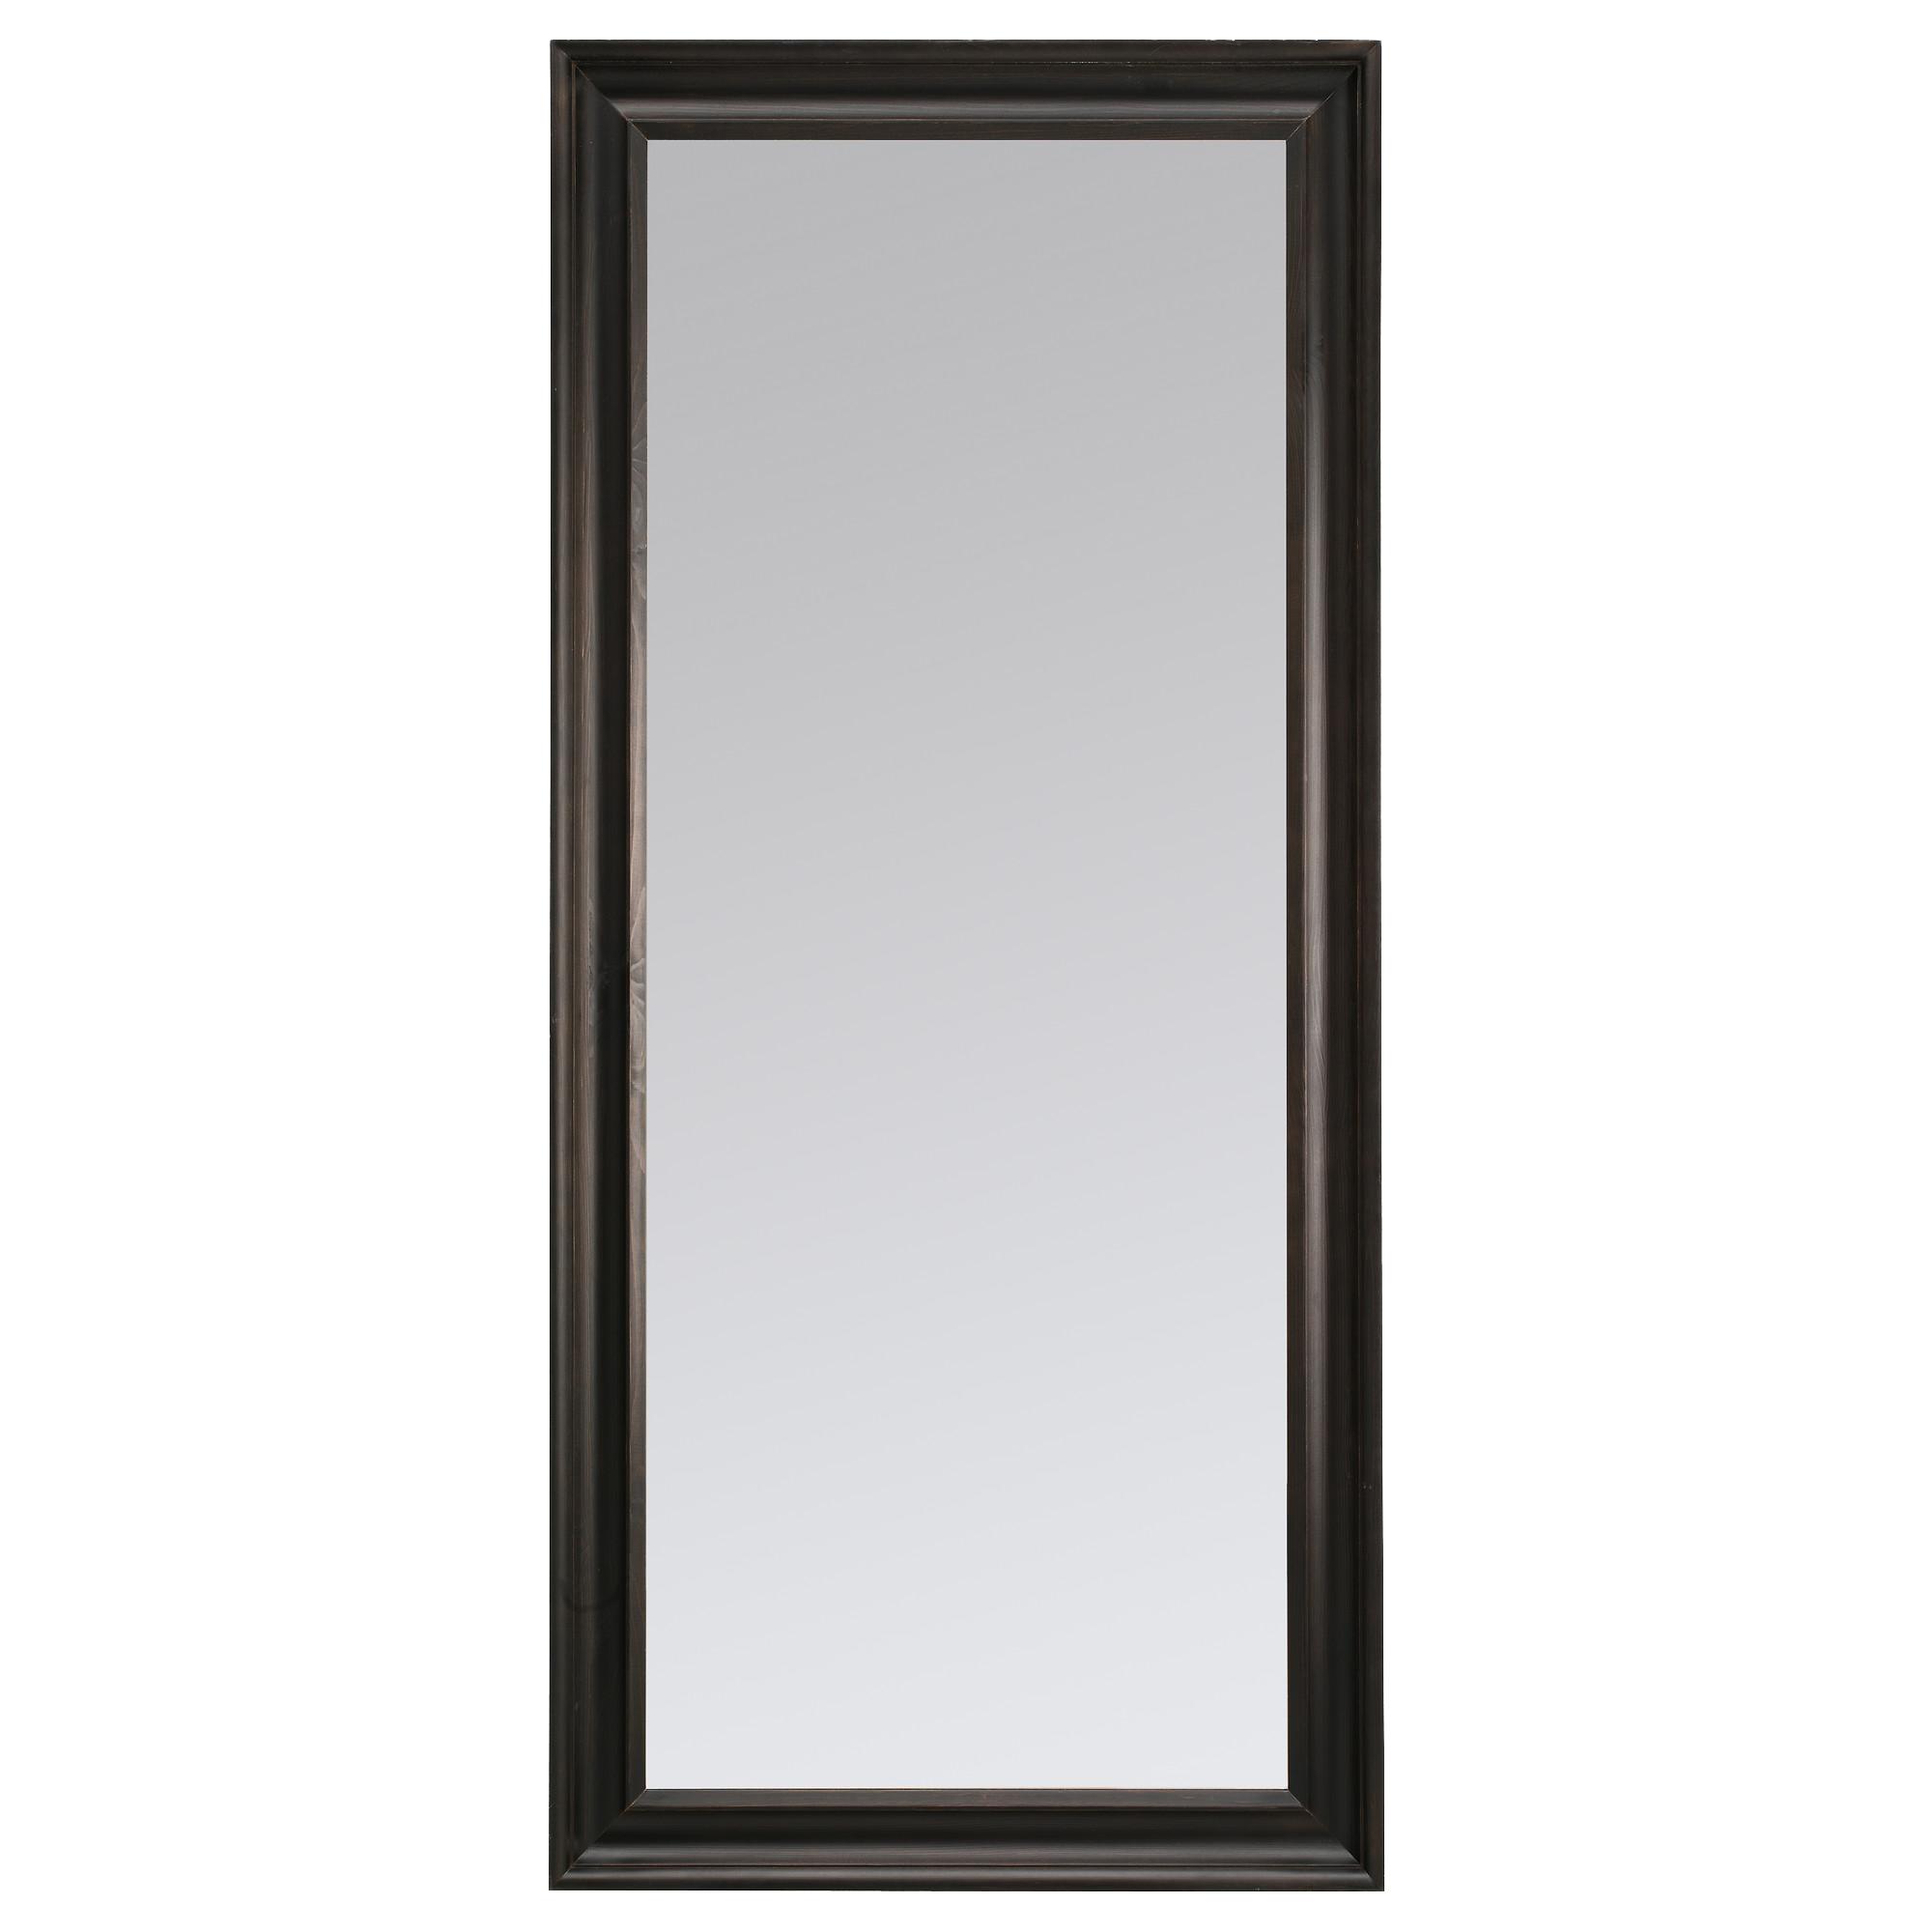 Mirror Transparent Background - Mirror PNG